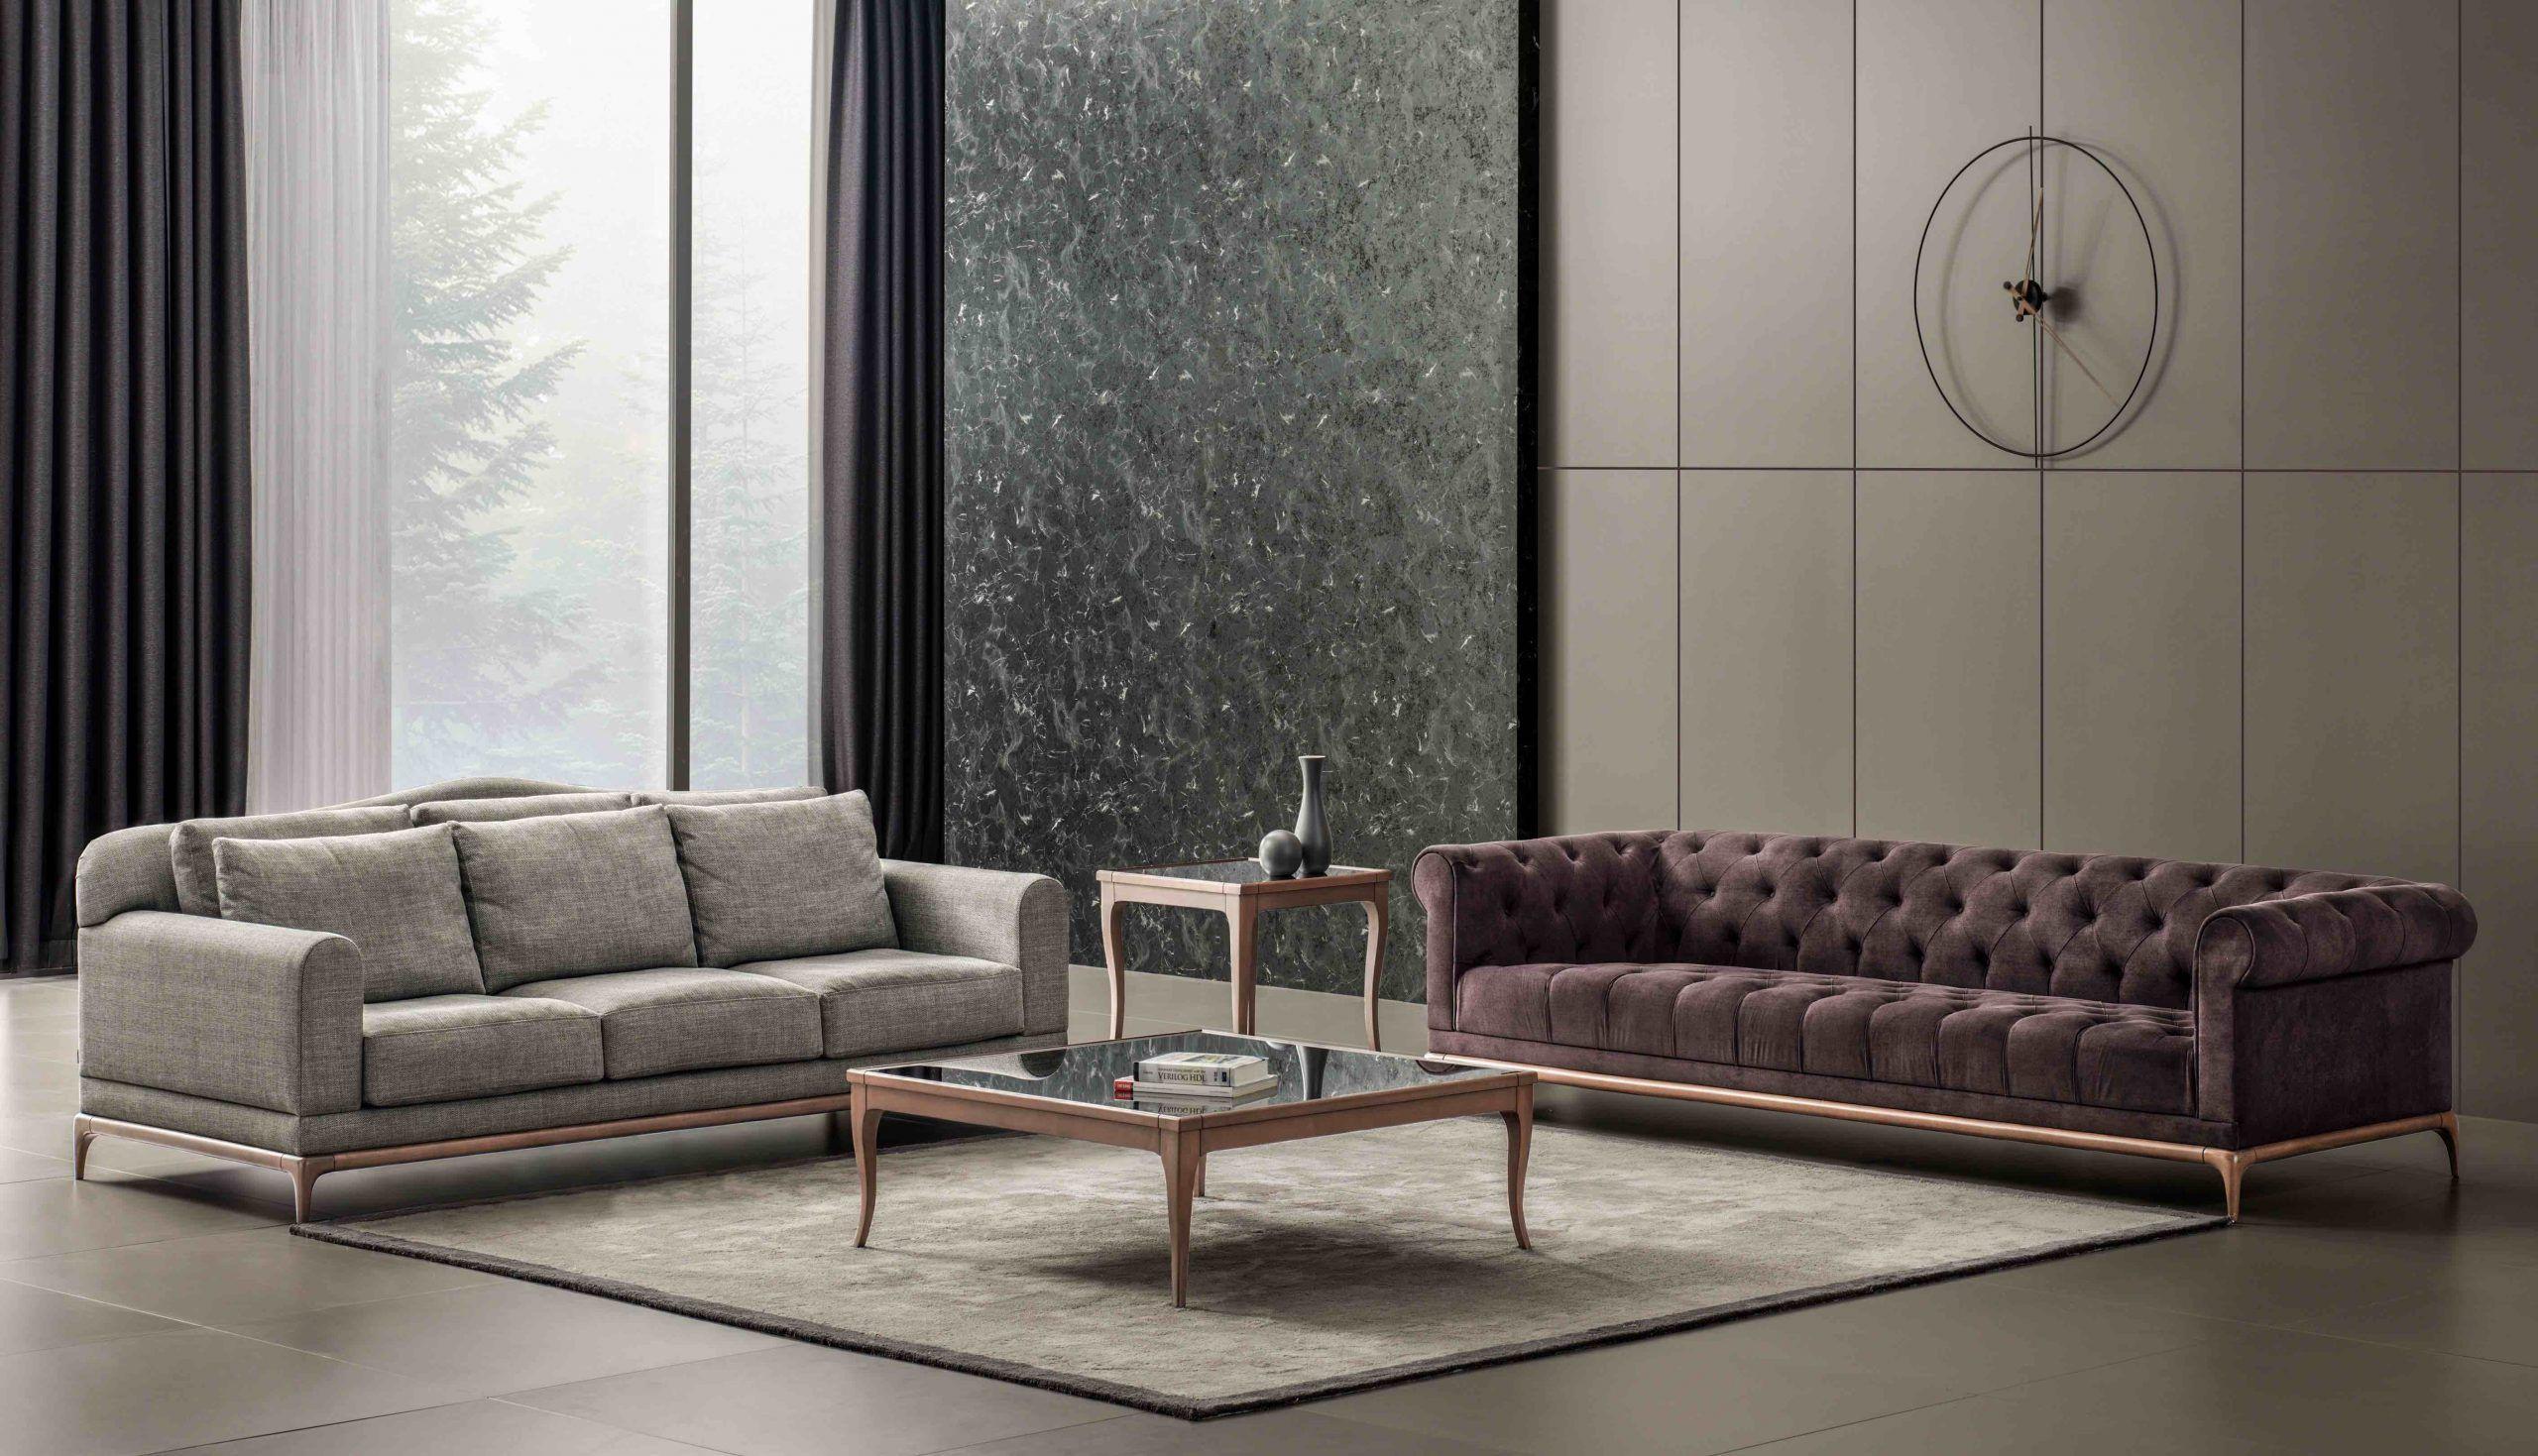 Lazzoni Mobilya Modern Koltuk Takimlari In 2020 Sitzgruppe Modern Kreatives Design